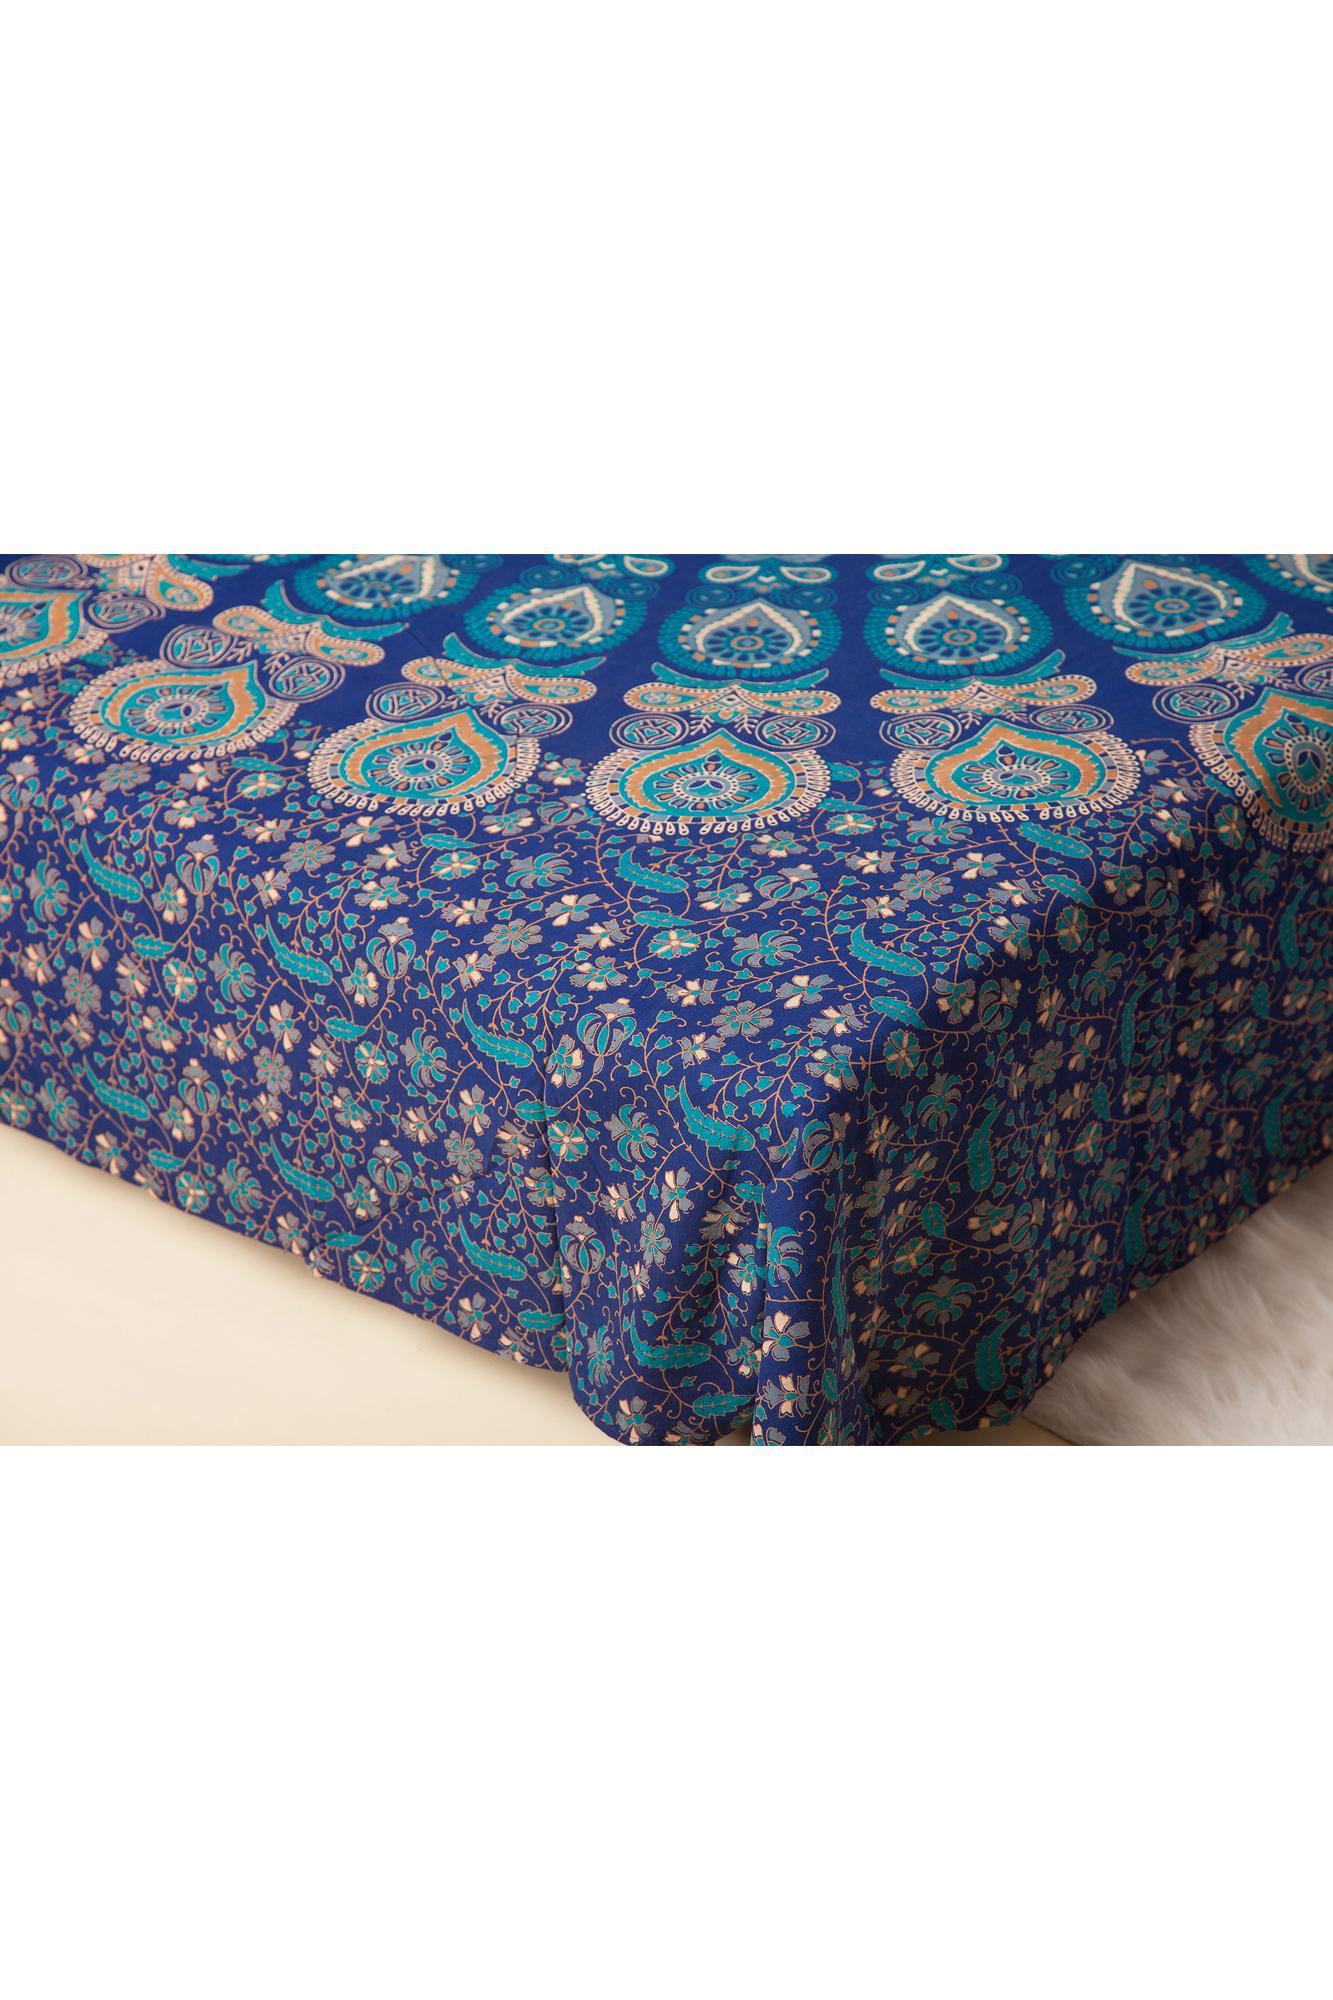 Cuvertura bleumarin dubla cu imprimeu mandala